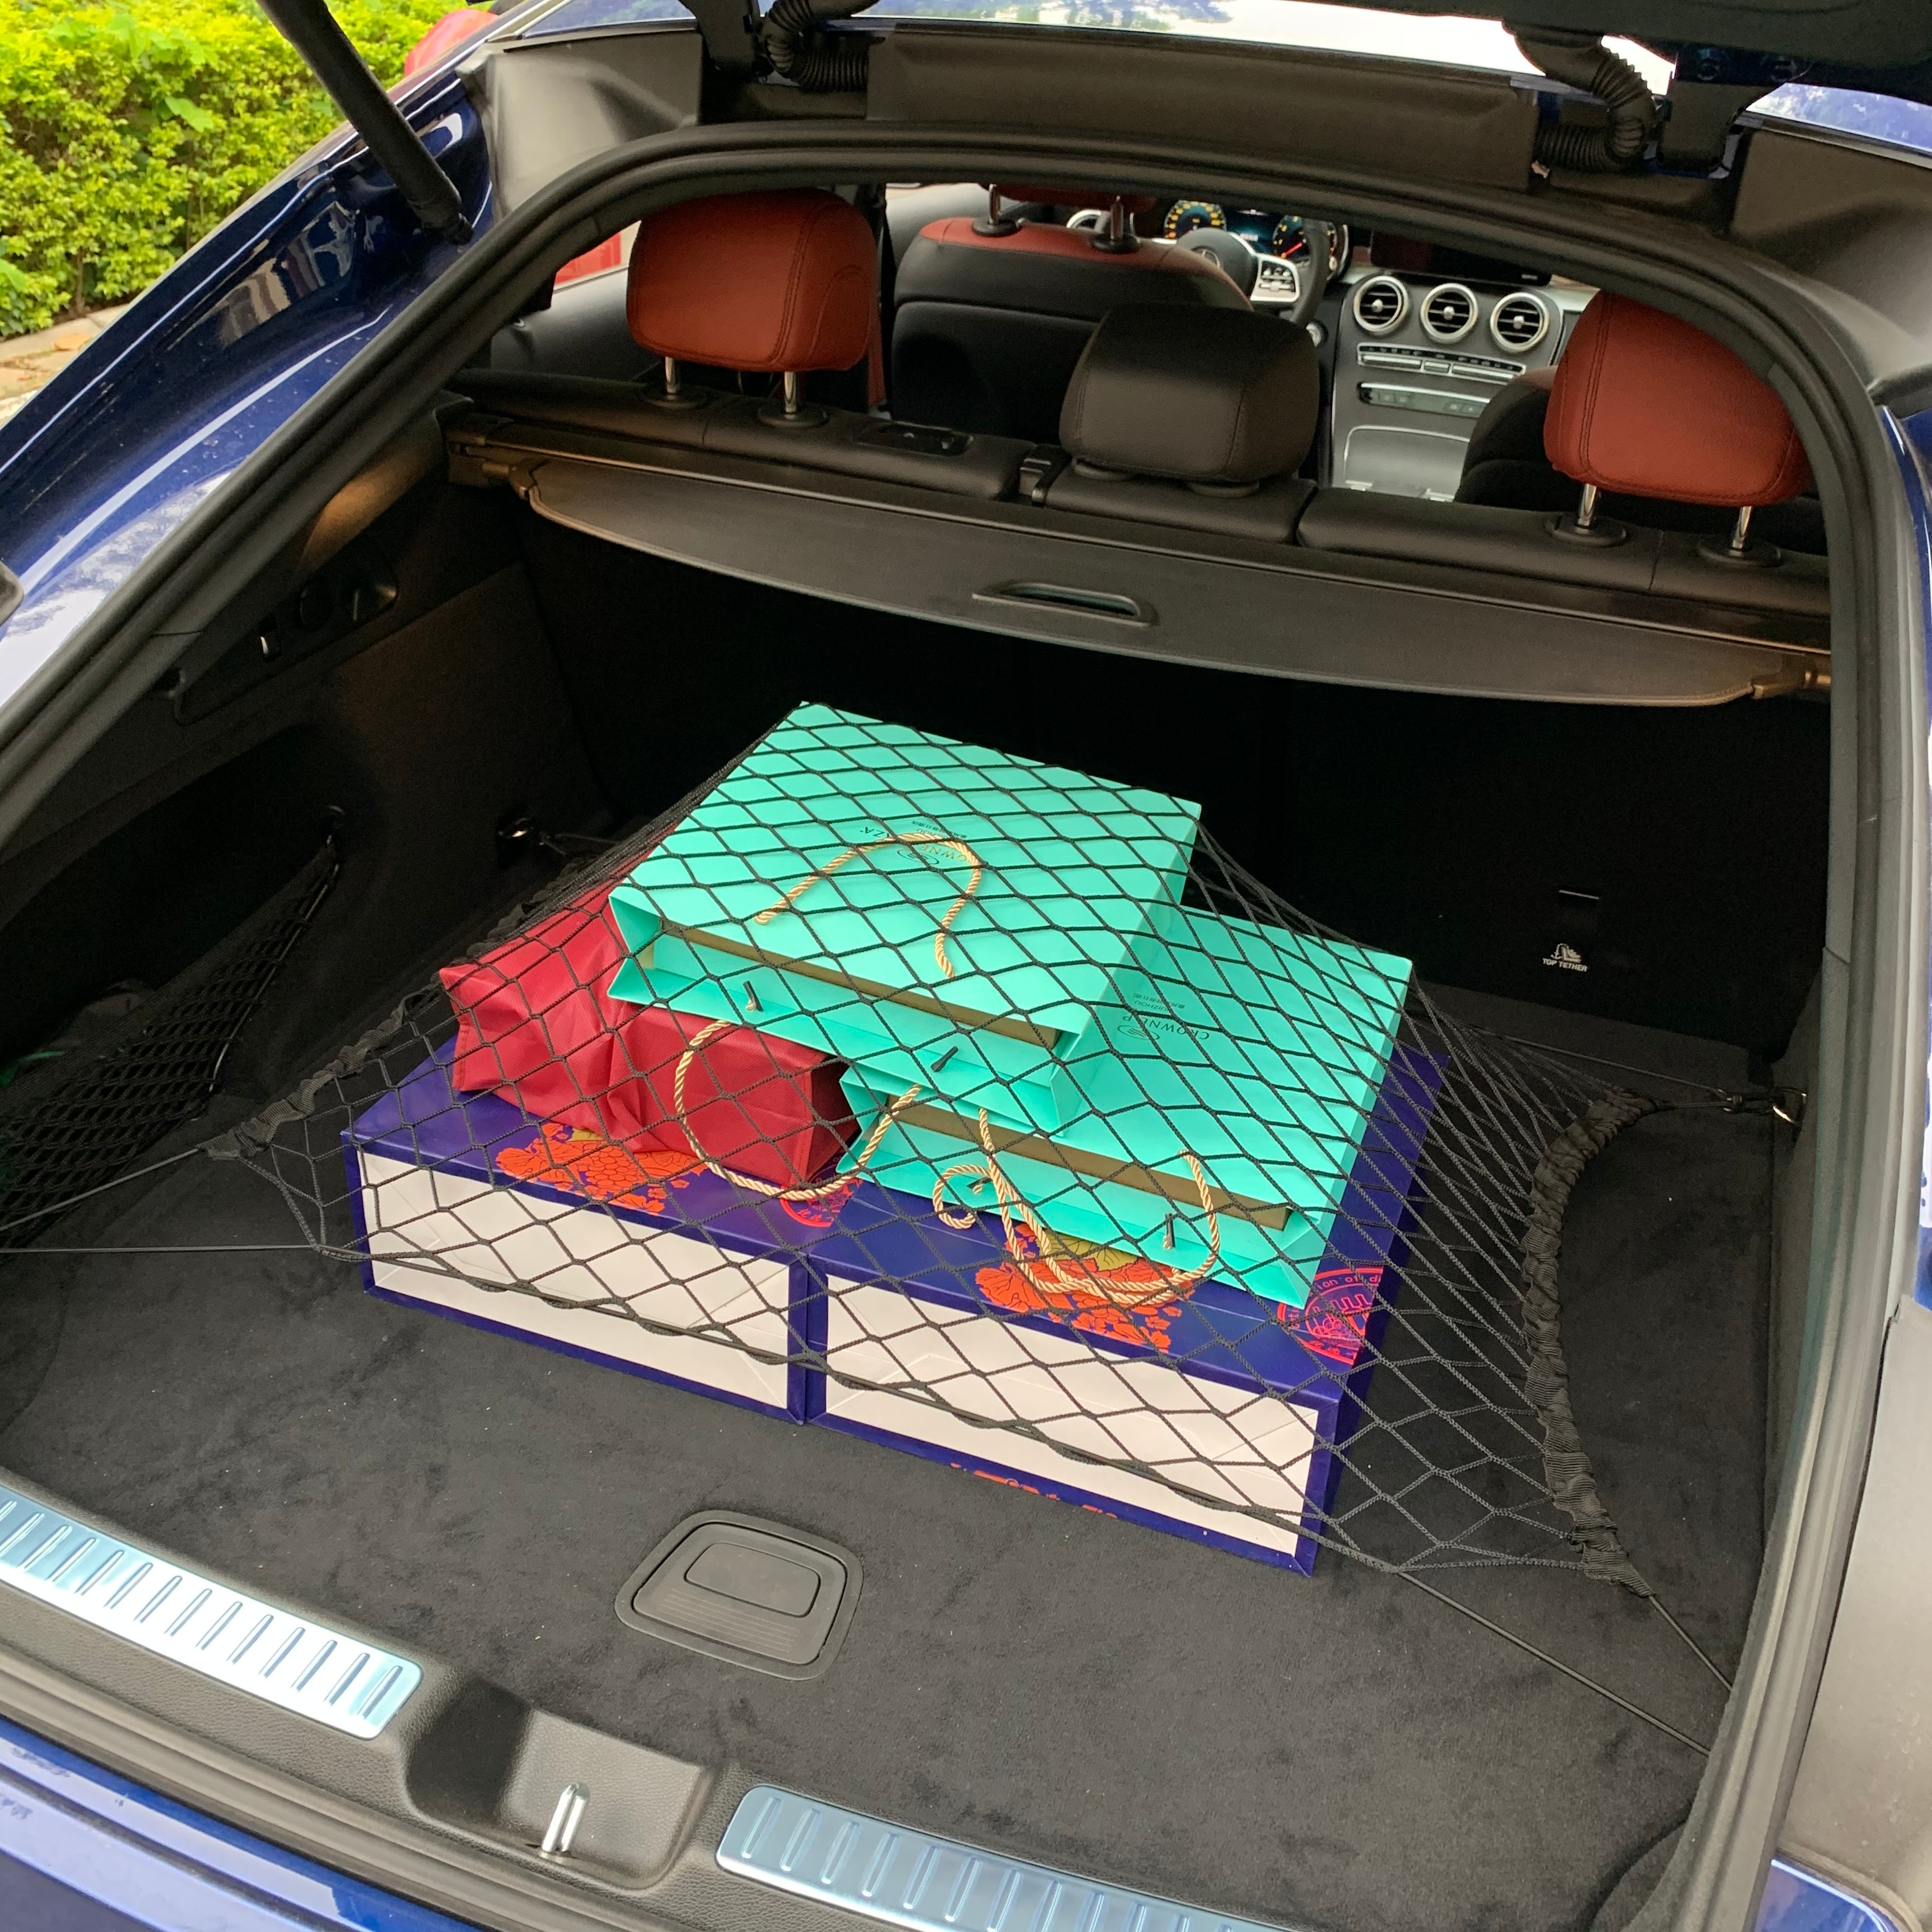 Car Rear Cargo Trunk Storage Organizer Net For Honda CRV Accord Odeysey Crosstour Jazz City Civic JADE Crider Spirior S660